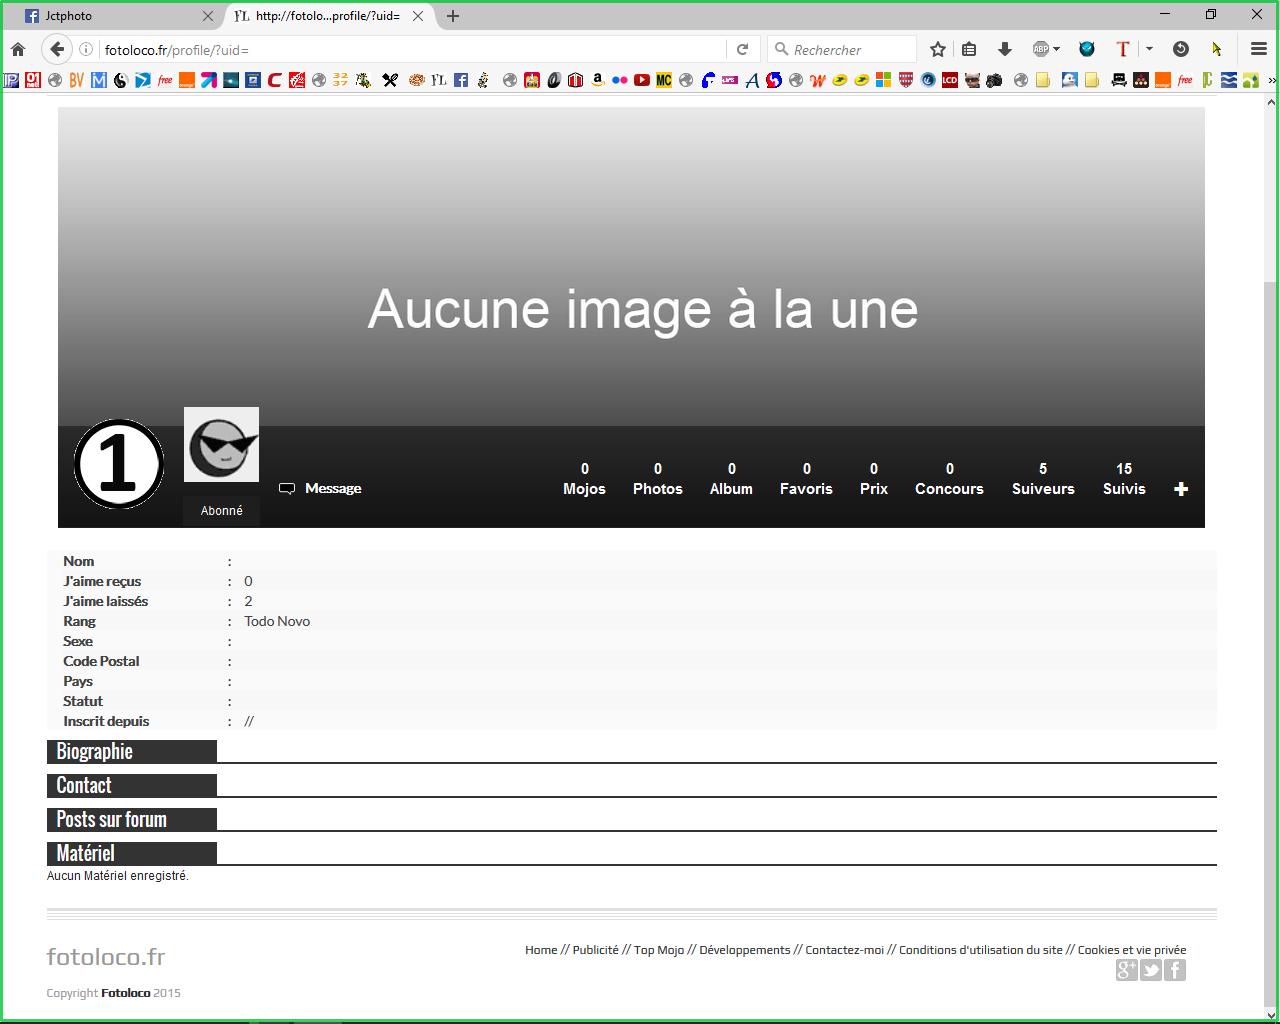 page-profil.jpg